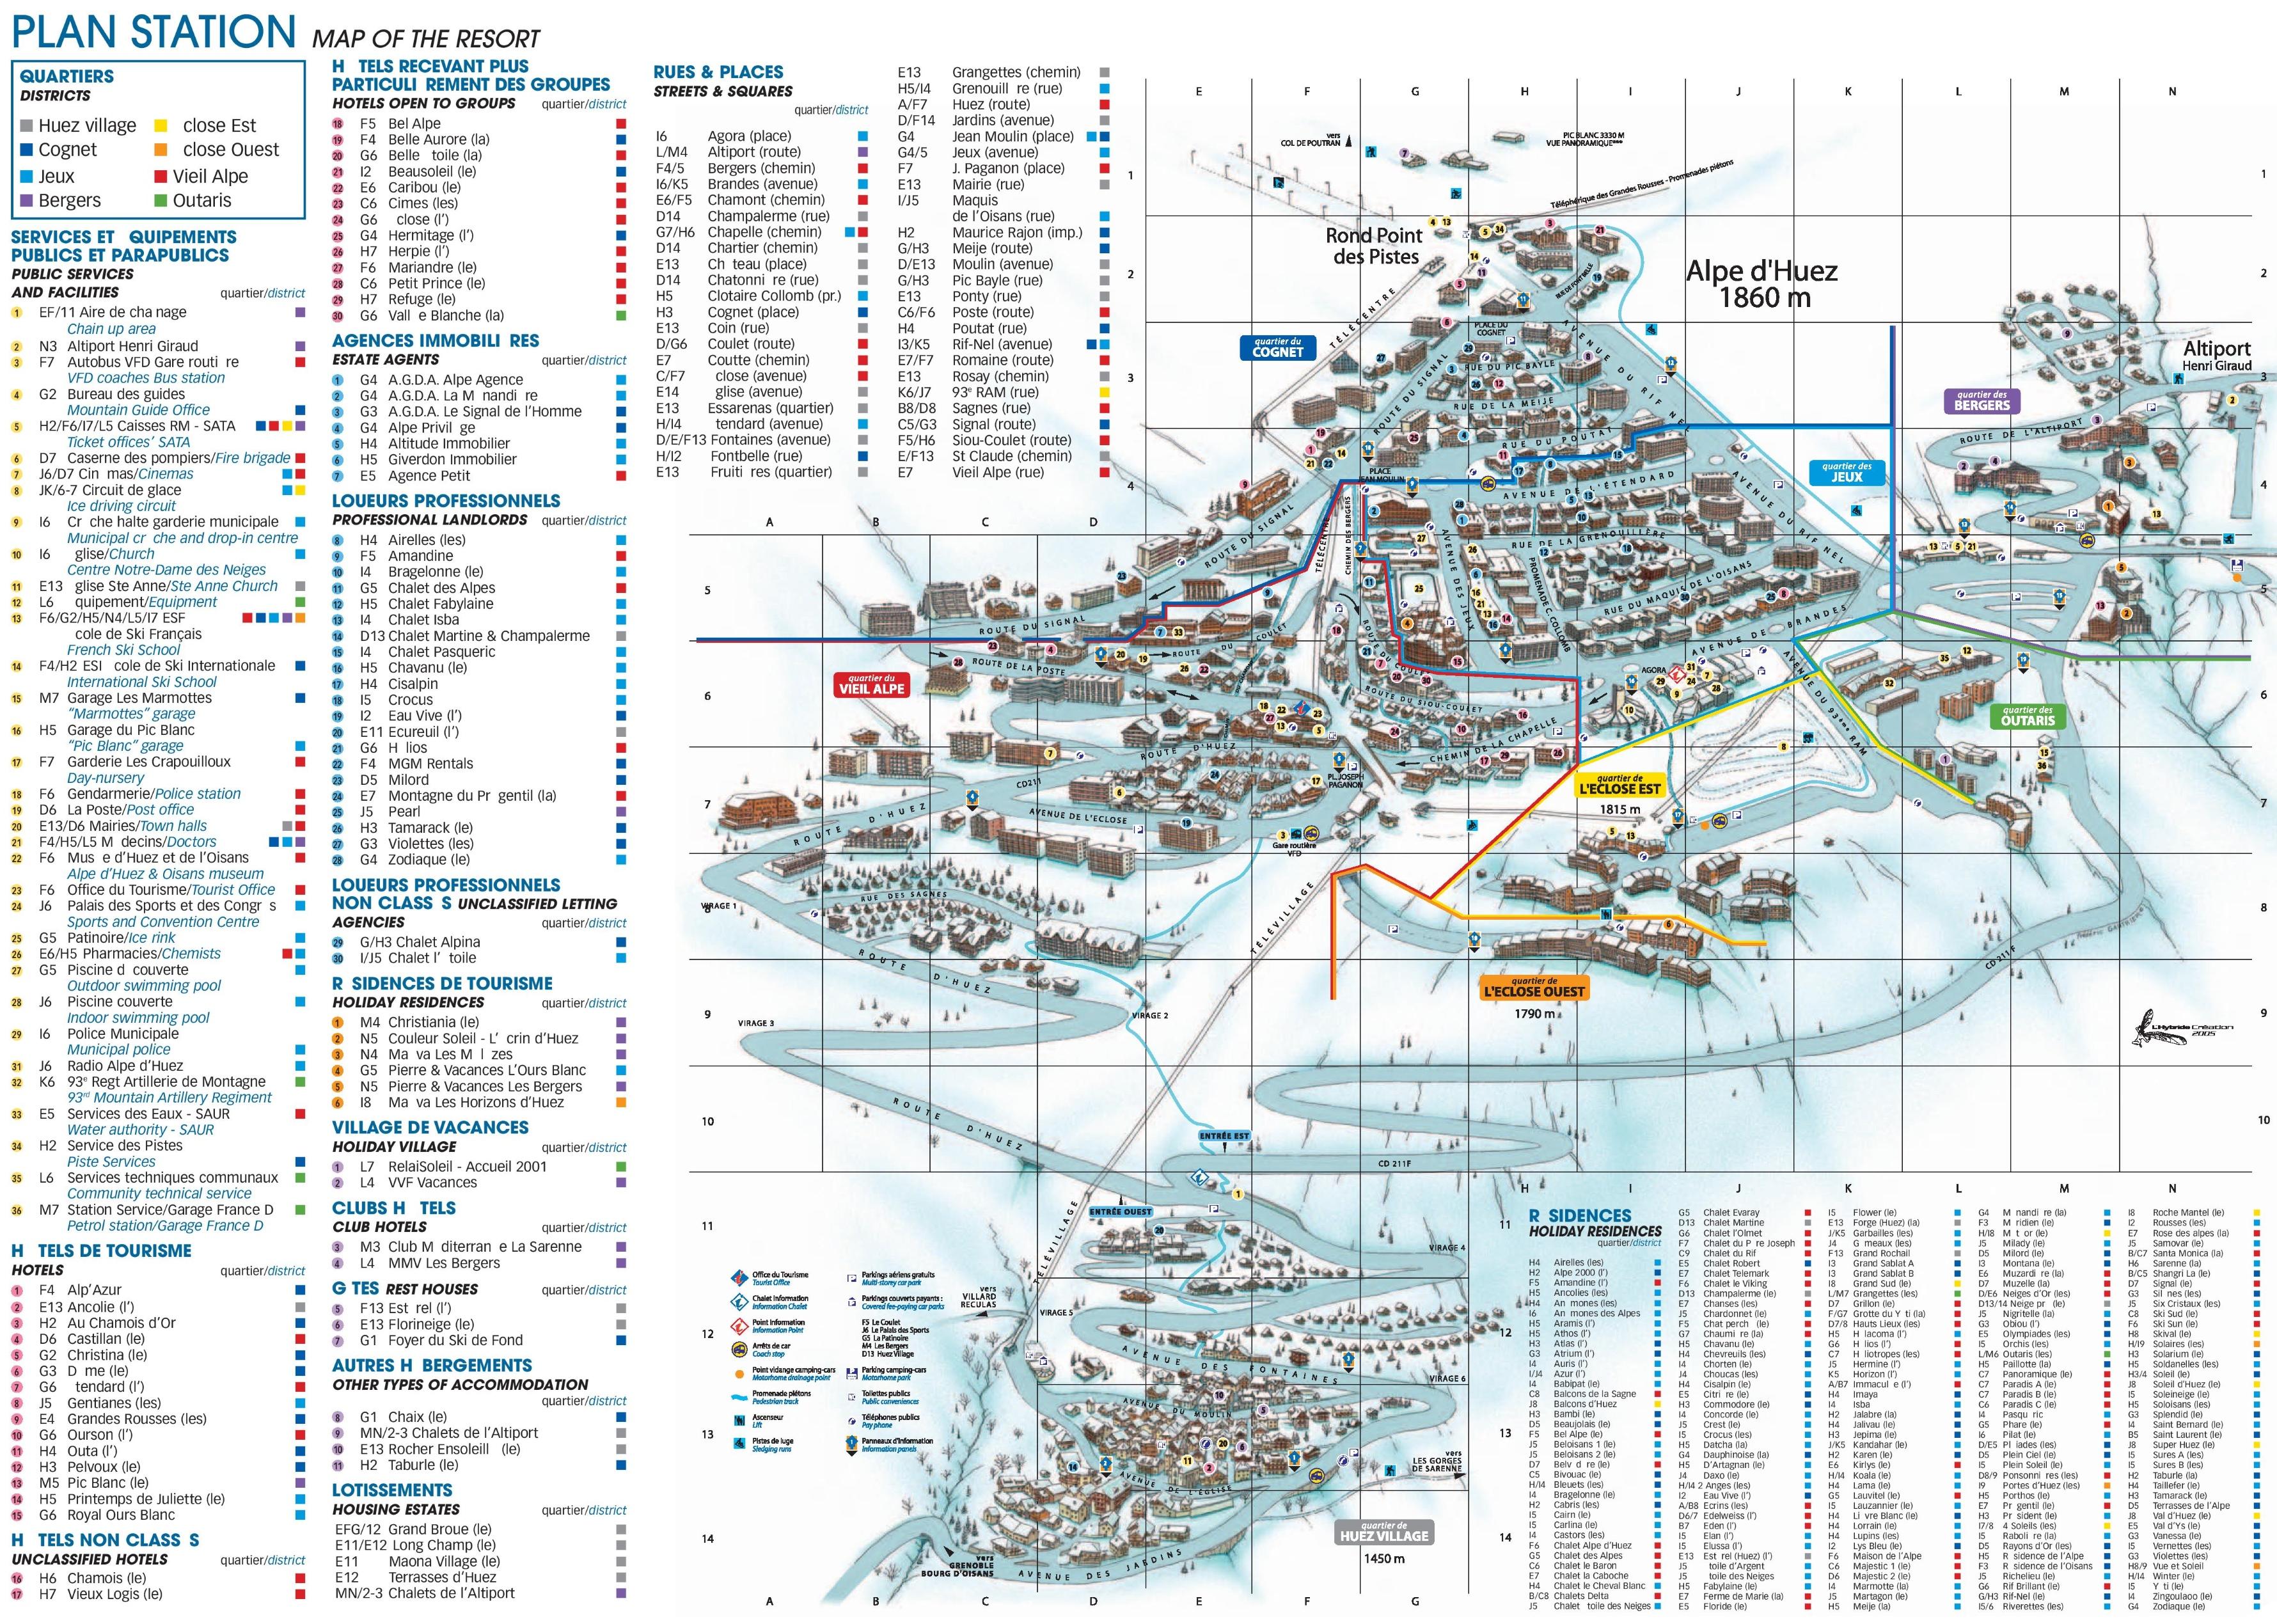 Alpe dHuez hotel map